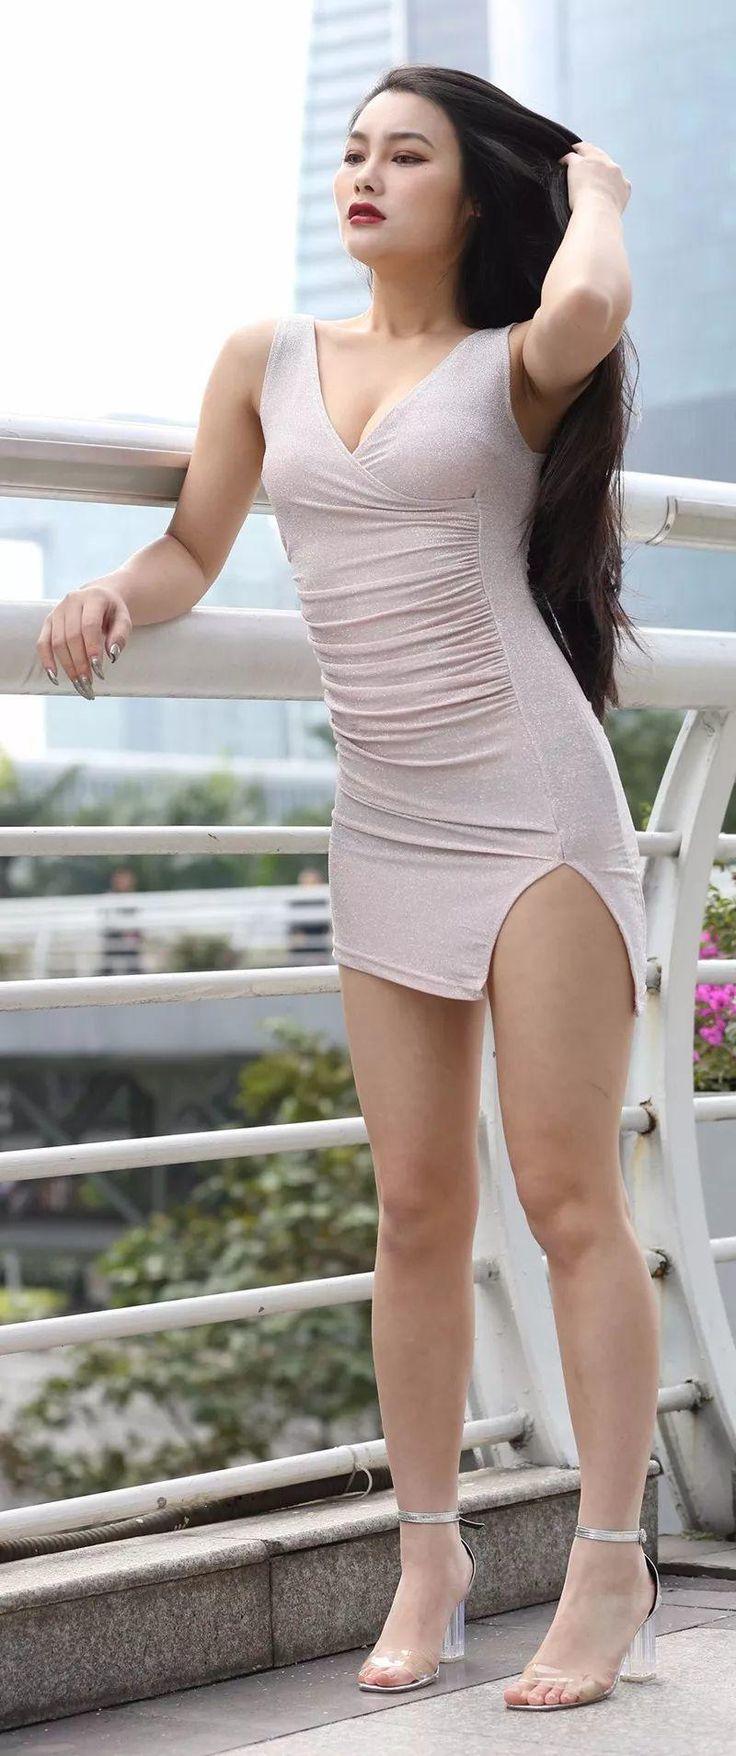 Pin on Ladies - Asian American